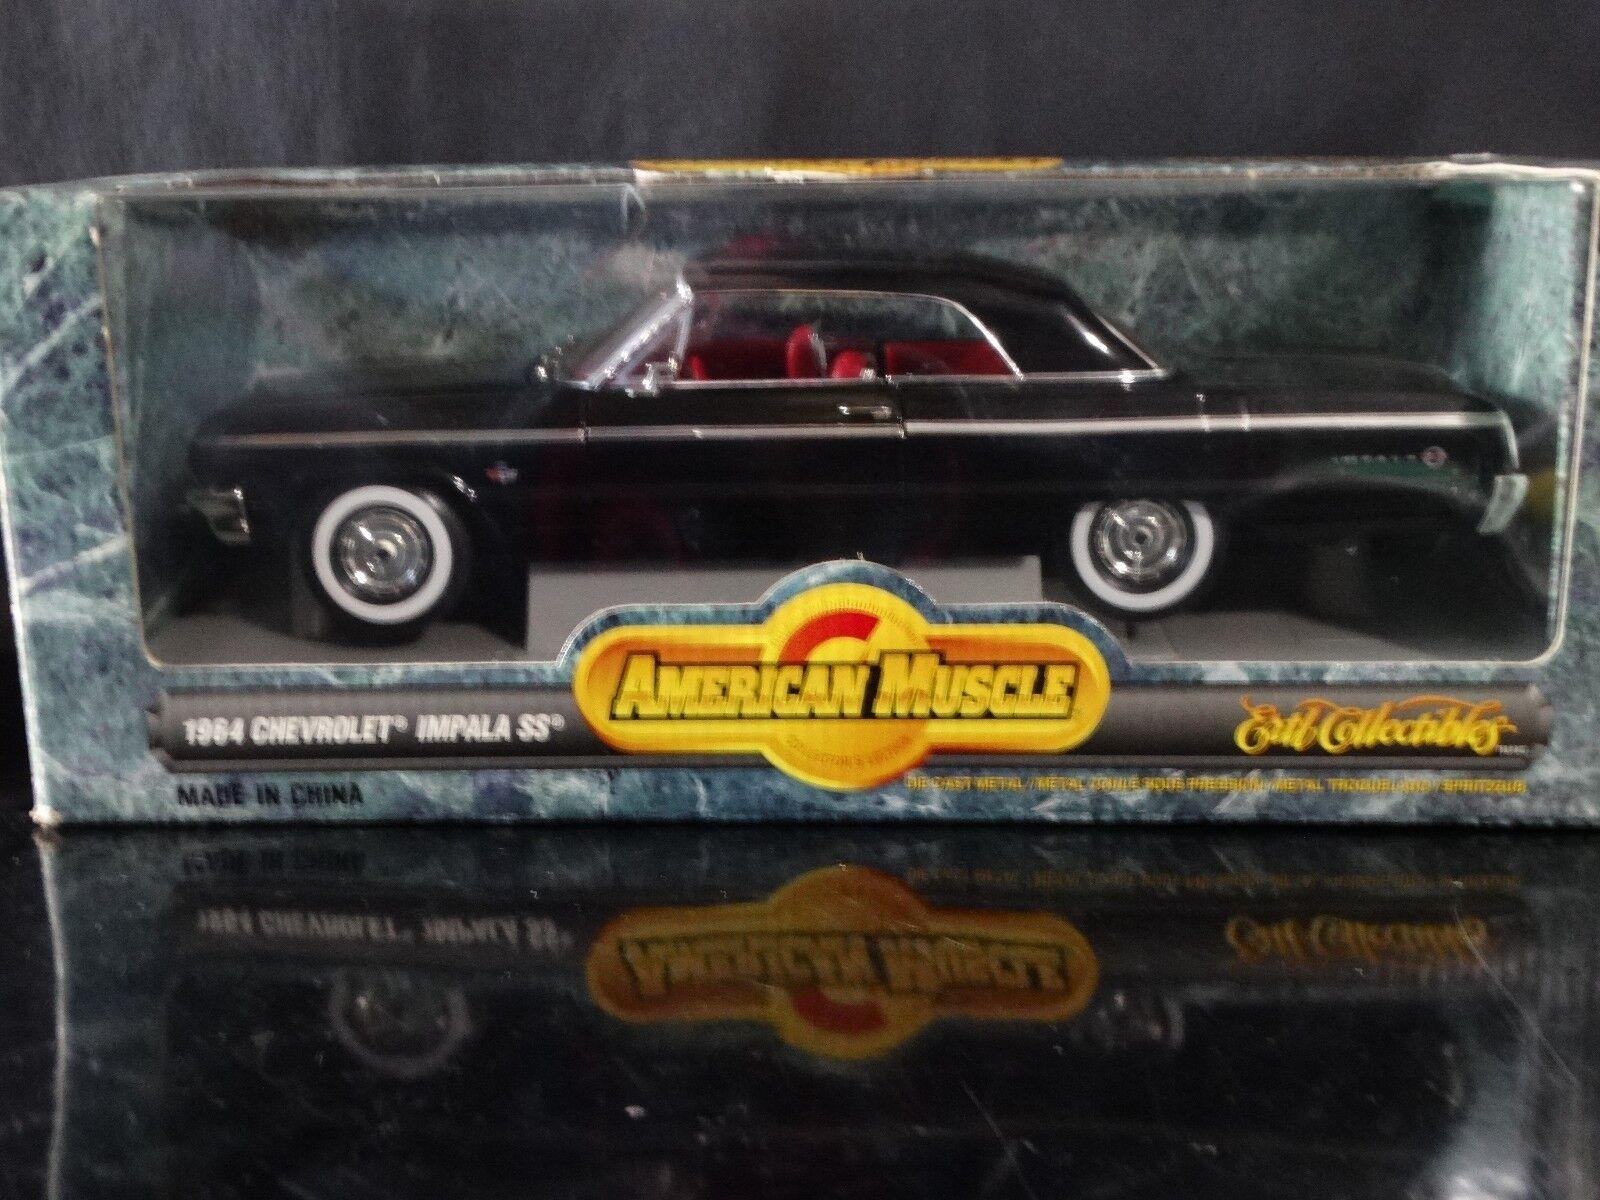 Ertl American Muscle 1 18 1964 Chevrolet Impala SS #7837 | eBay